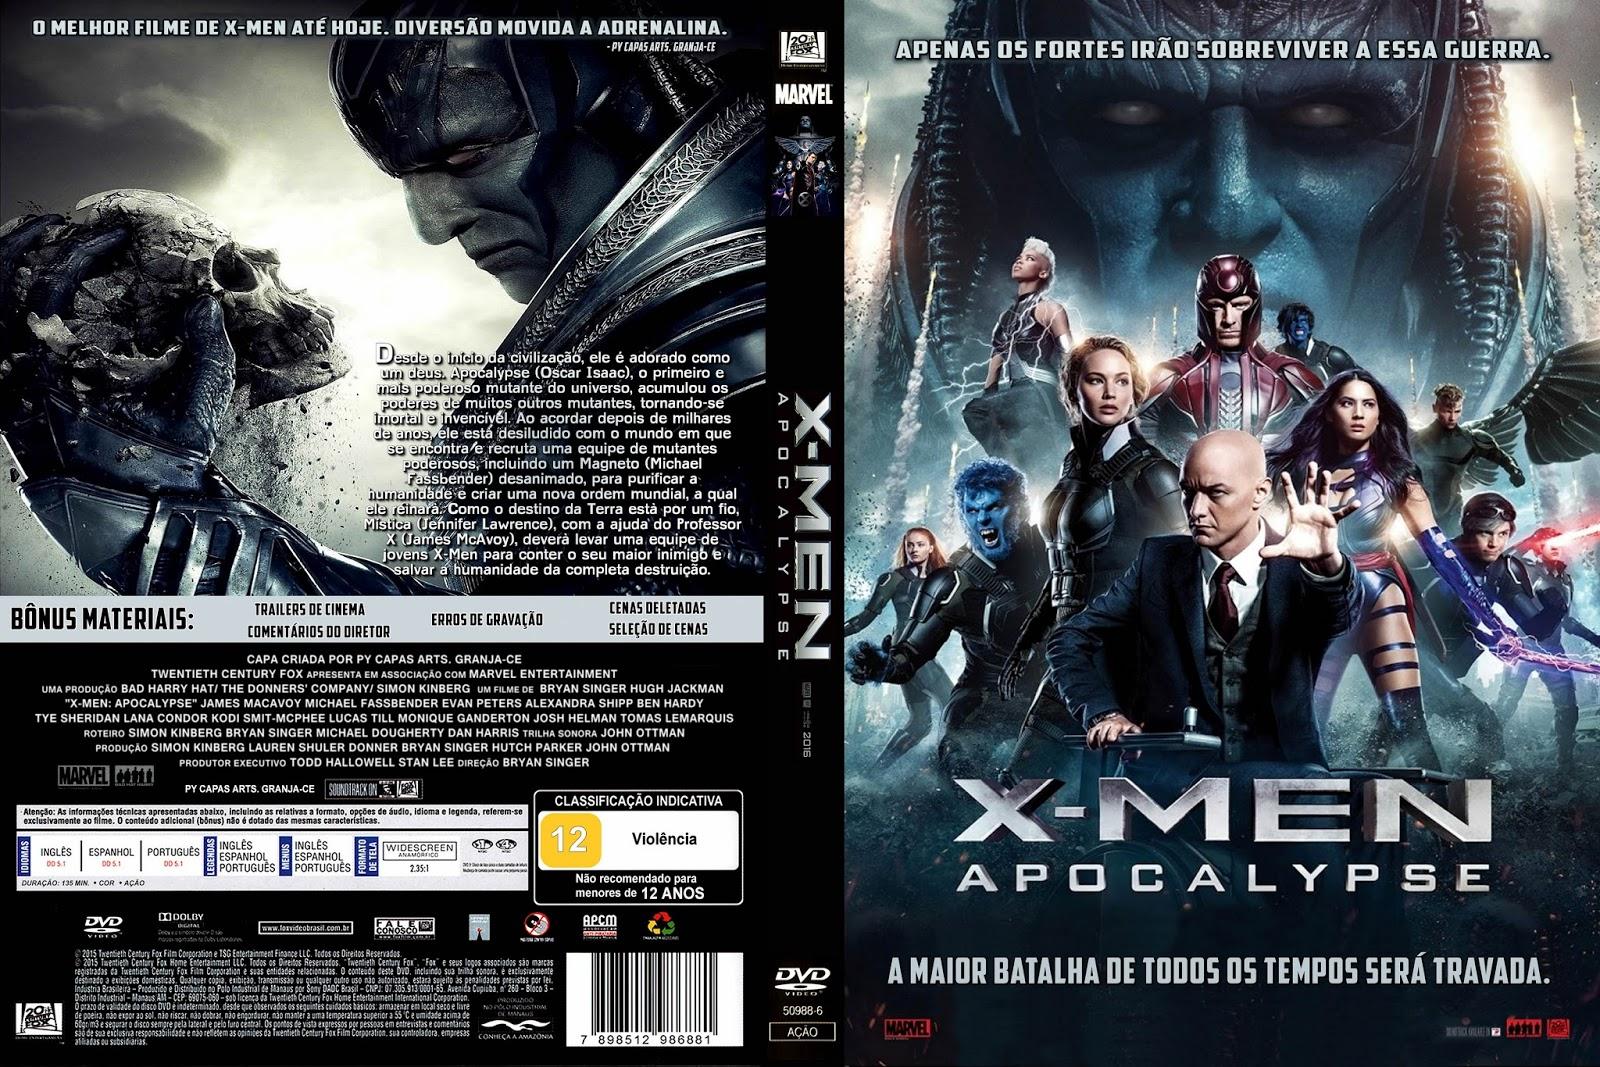 X-Men Apocalipse BDRip Dual Áudio X-Men Apocalipse BDRip Dual Áudio X Men 2B 2BApocalypse